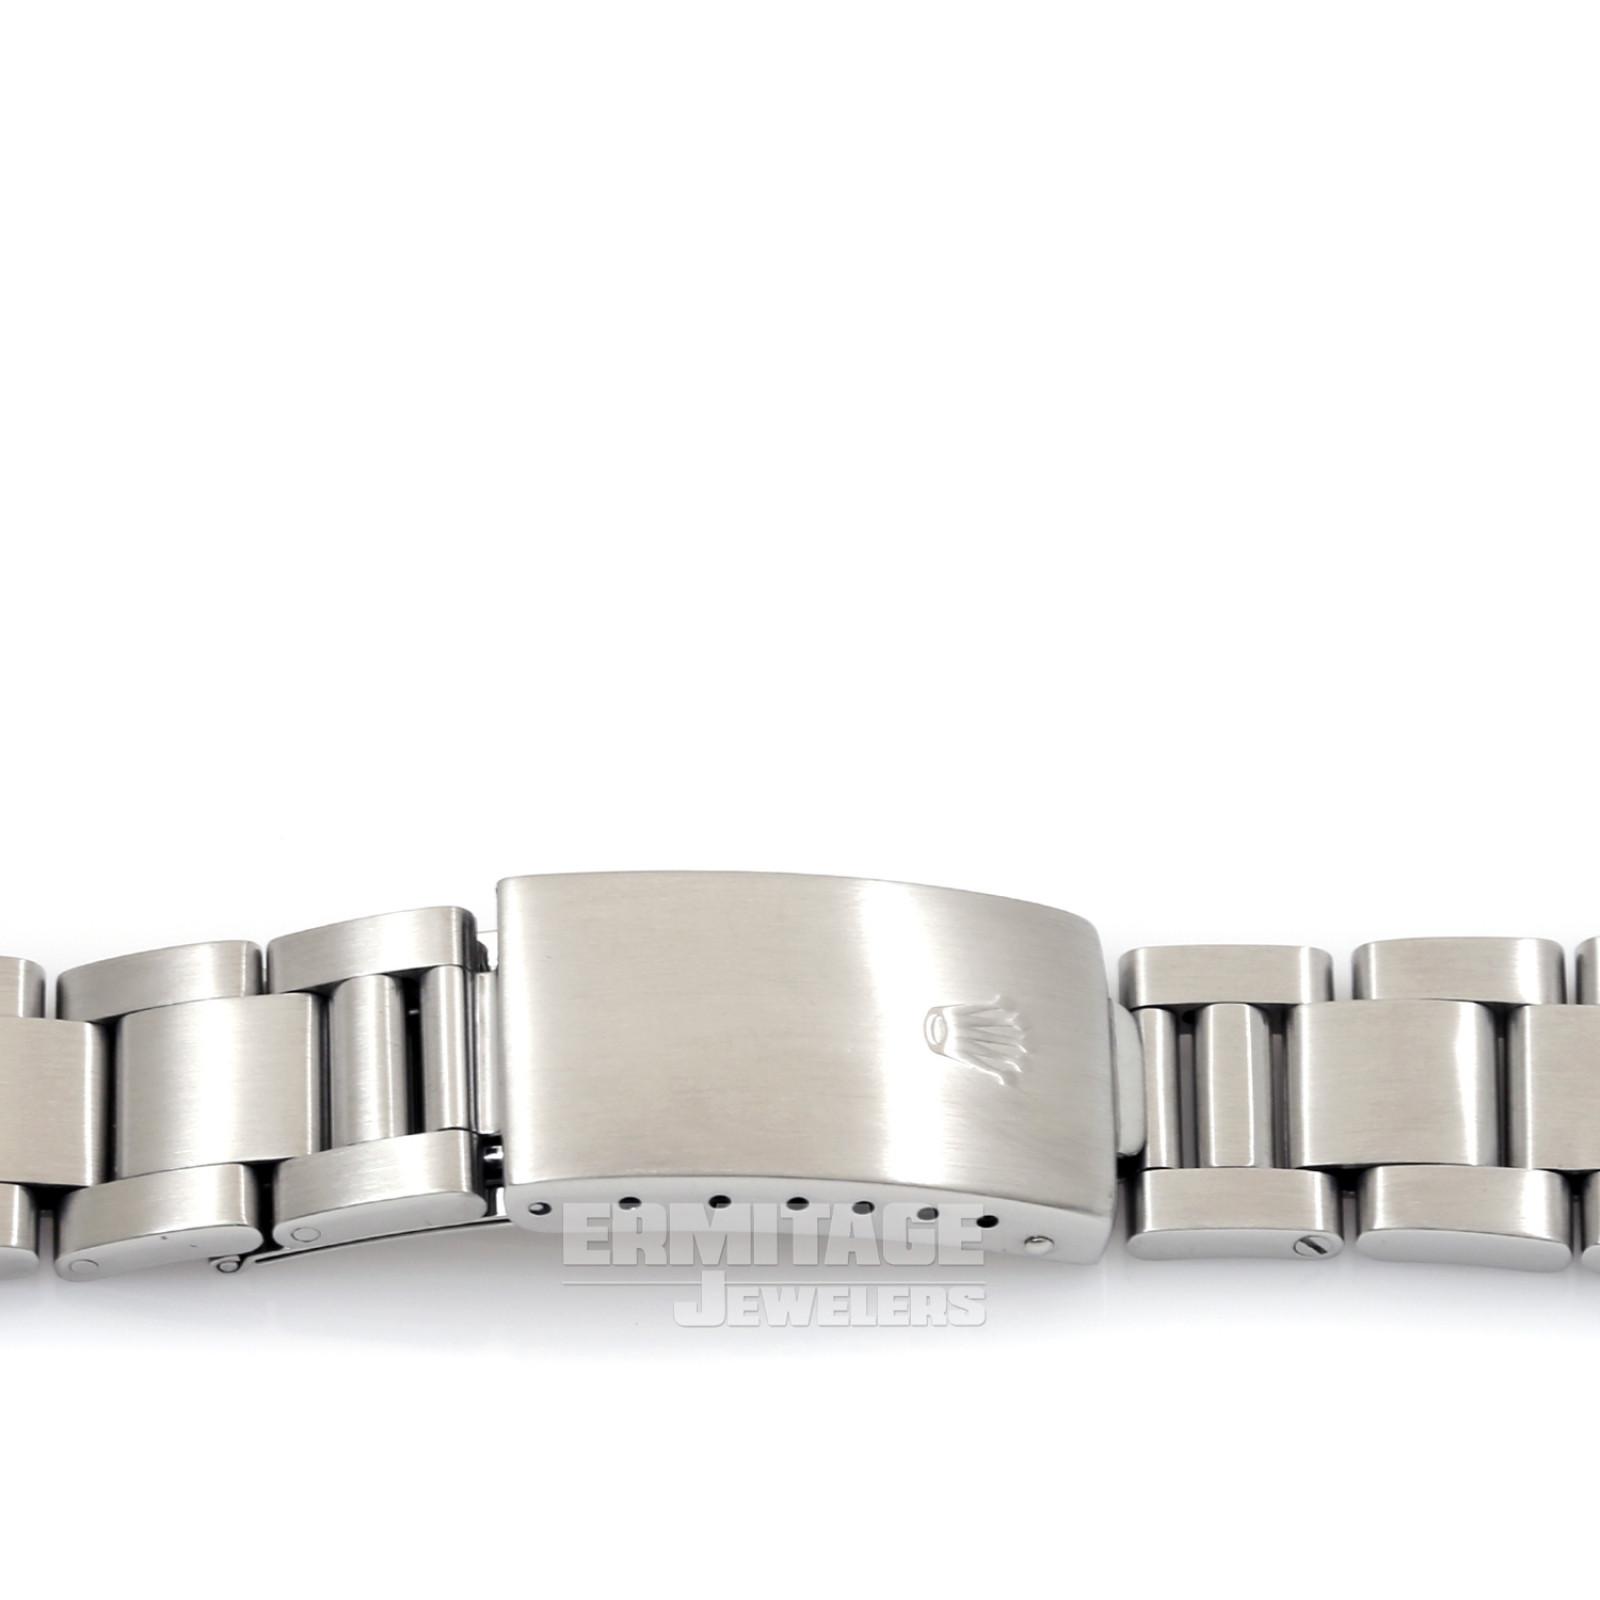 Steel on Oyster Rolex Explorer 1016 36 mm